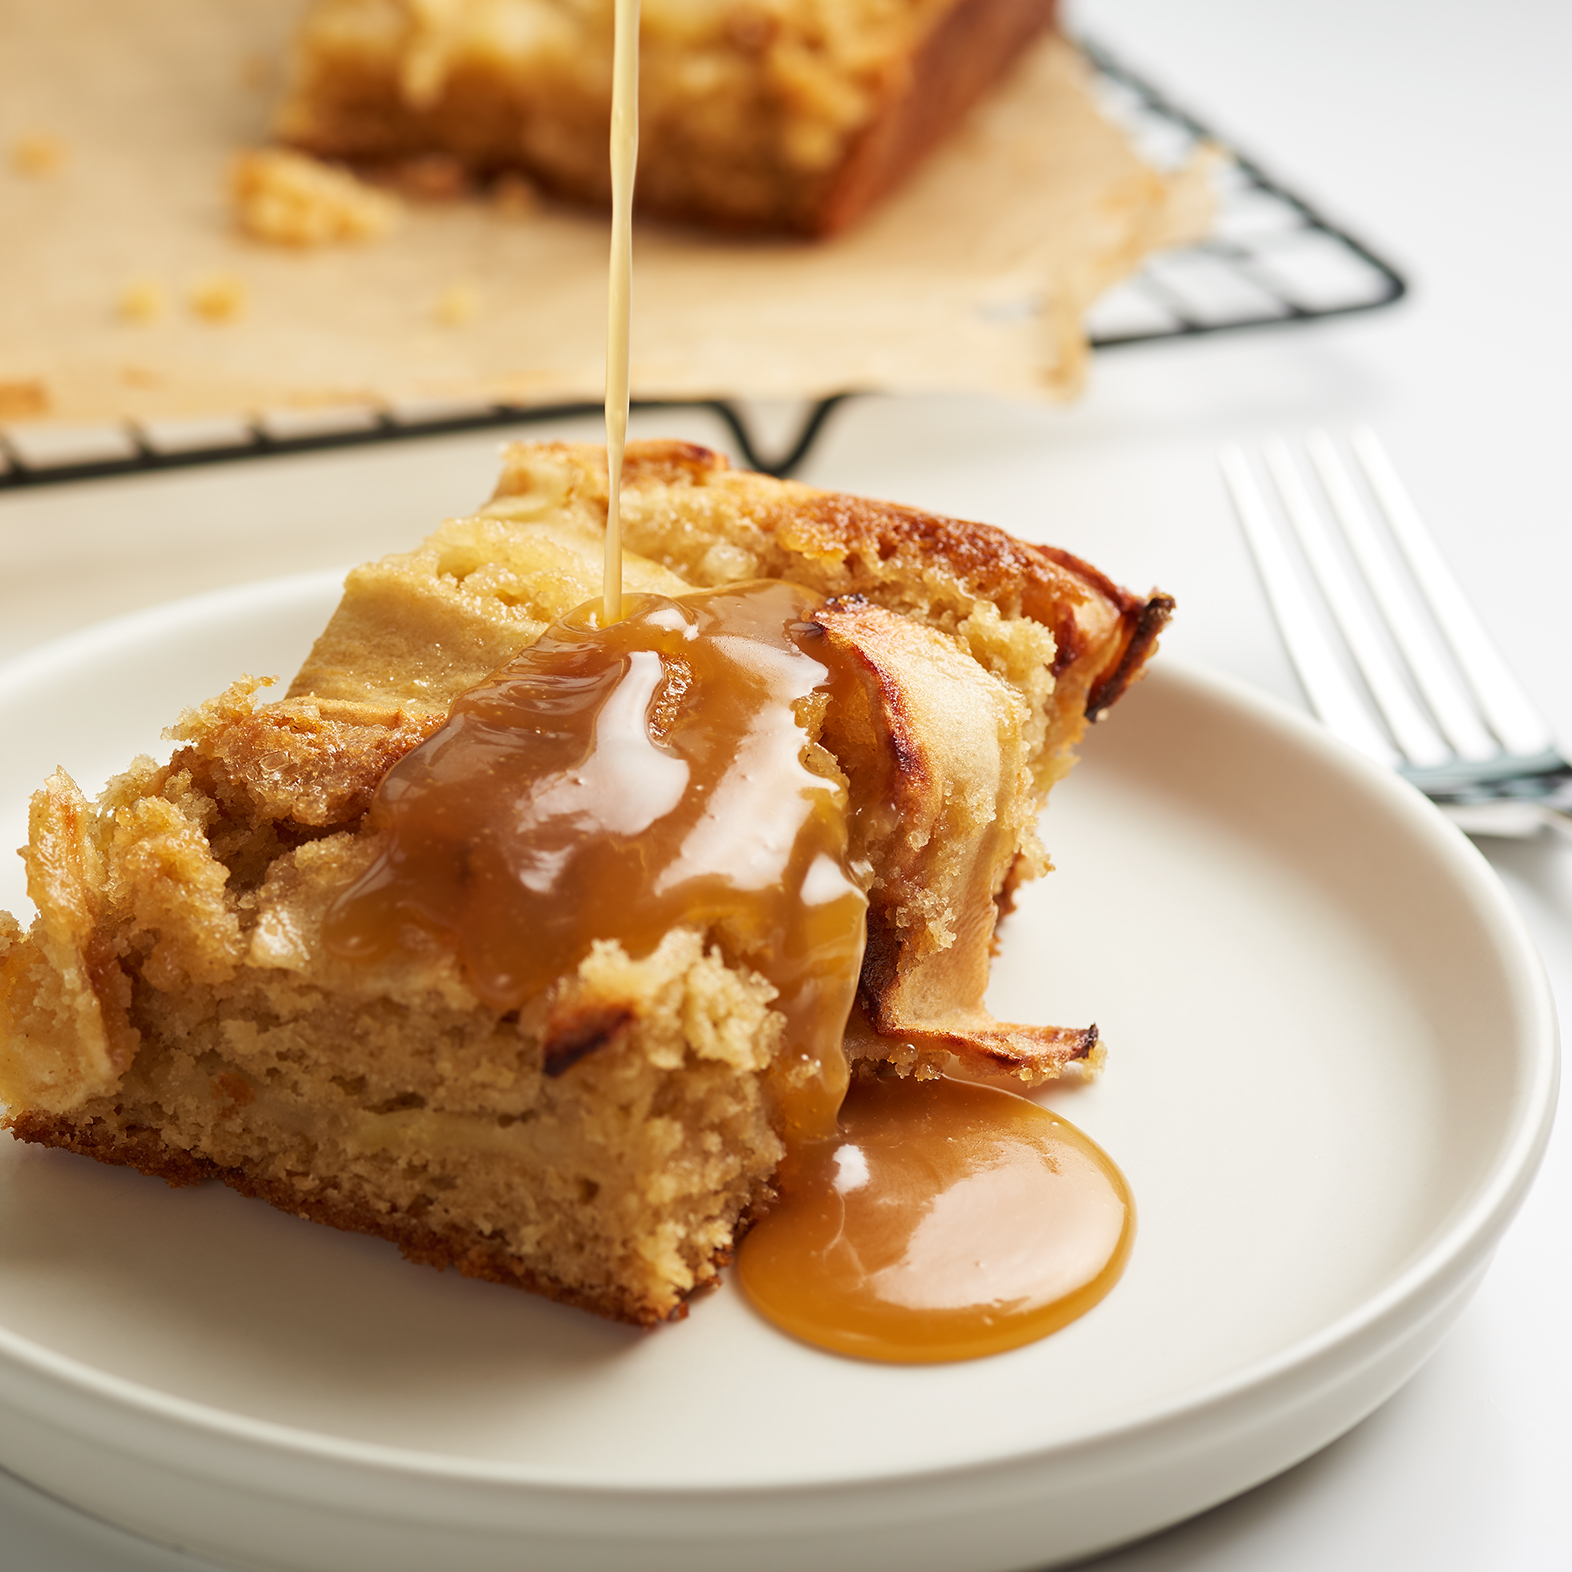 Toffee apple traybake